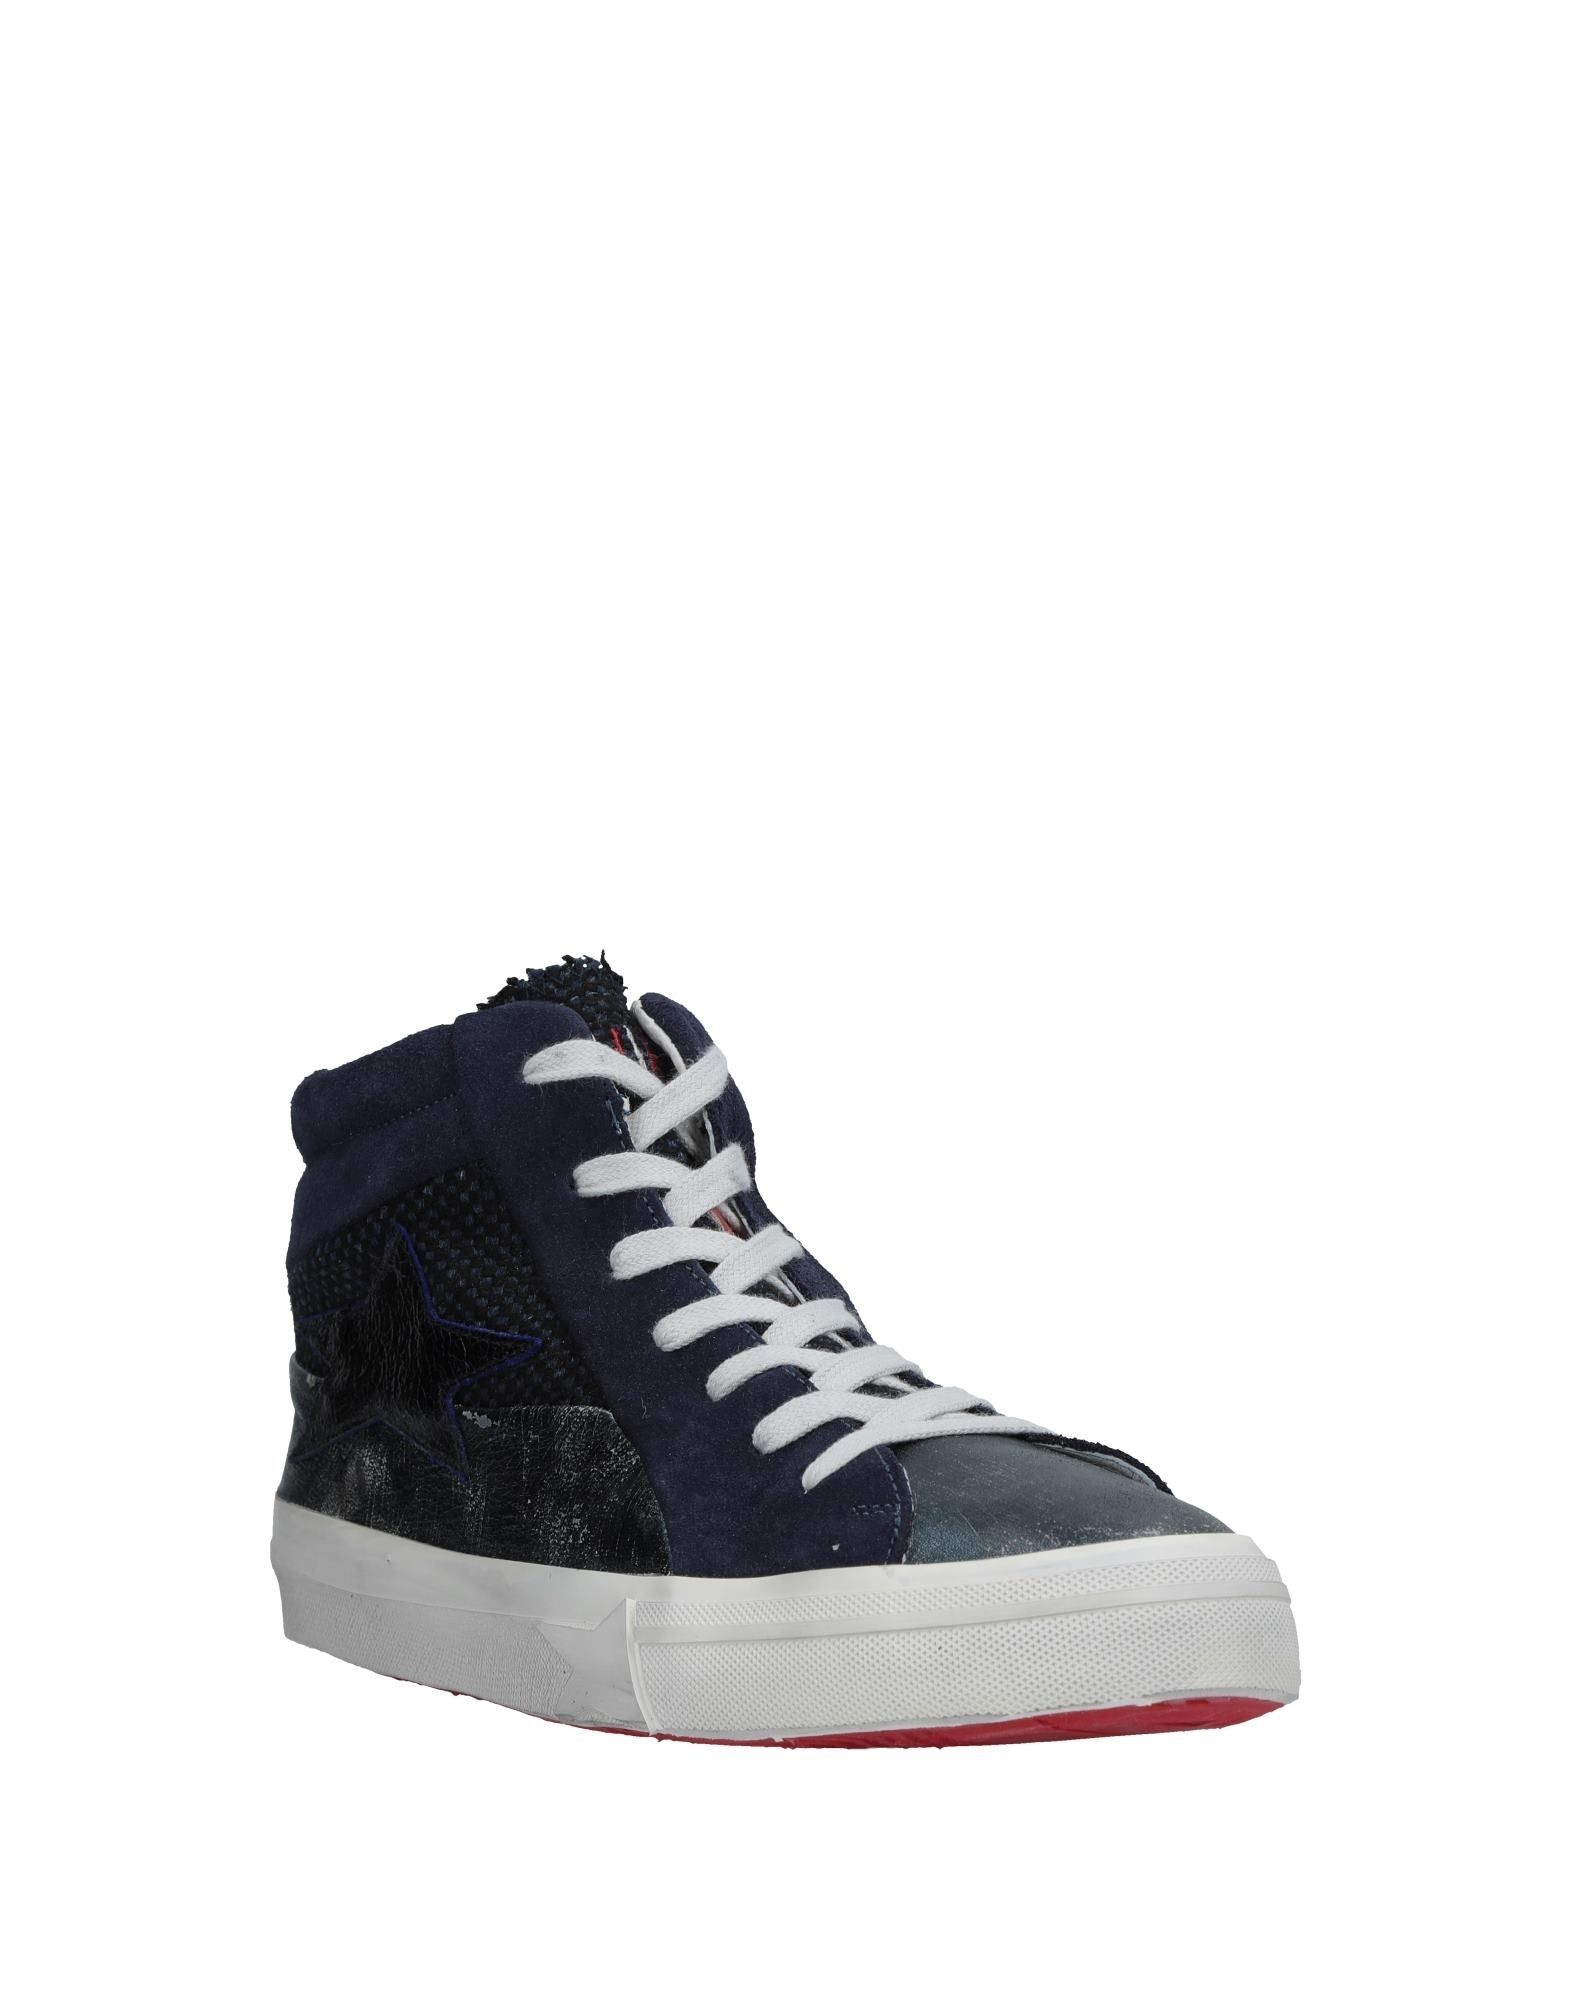 Herren Ishikawa Sneakers Herren   11523819DJ Heiße Schuhe 408c7f